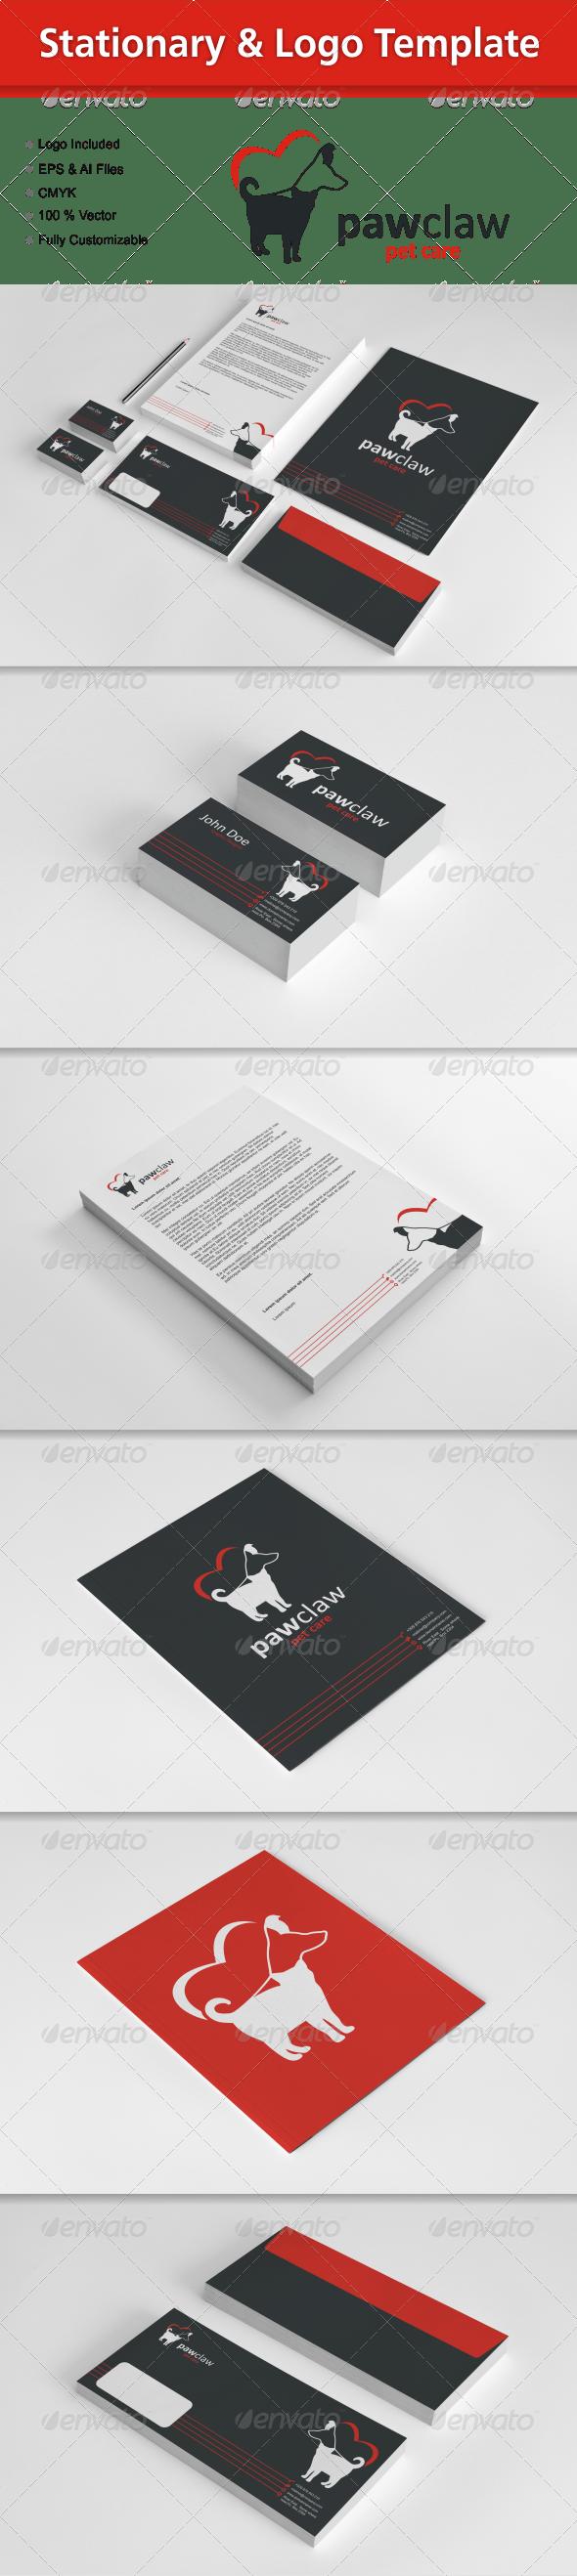 Stationary & Logo Template - Stationery Print Templates